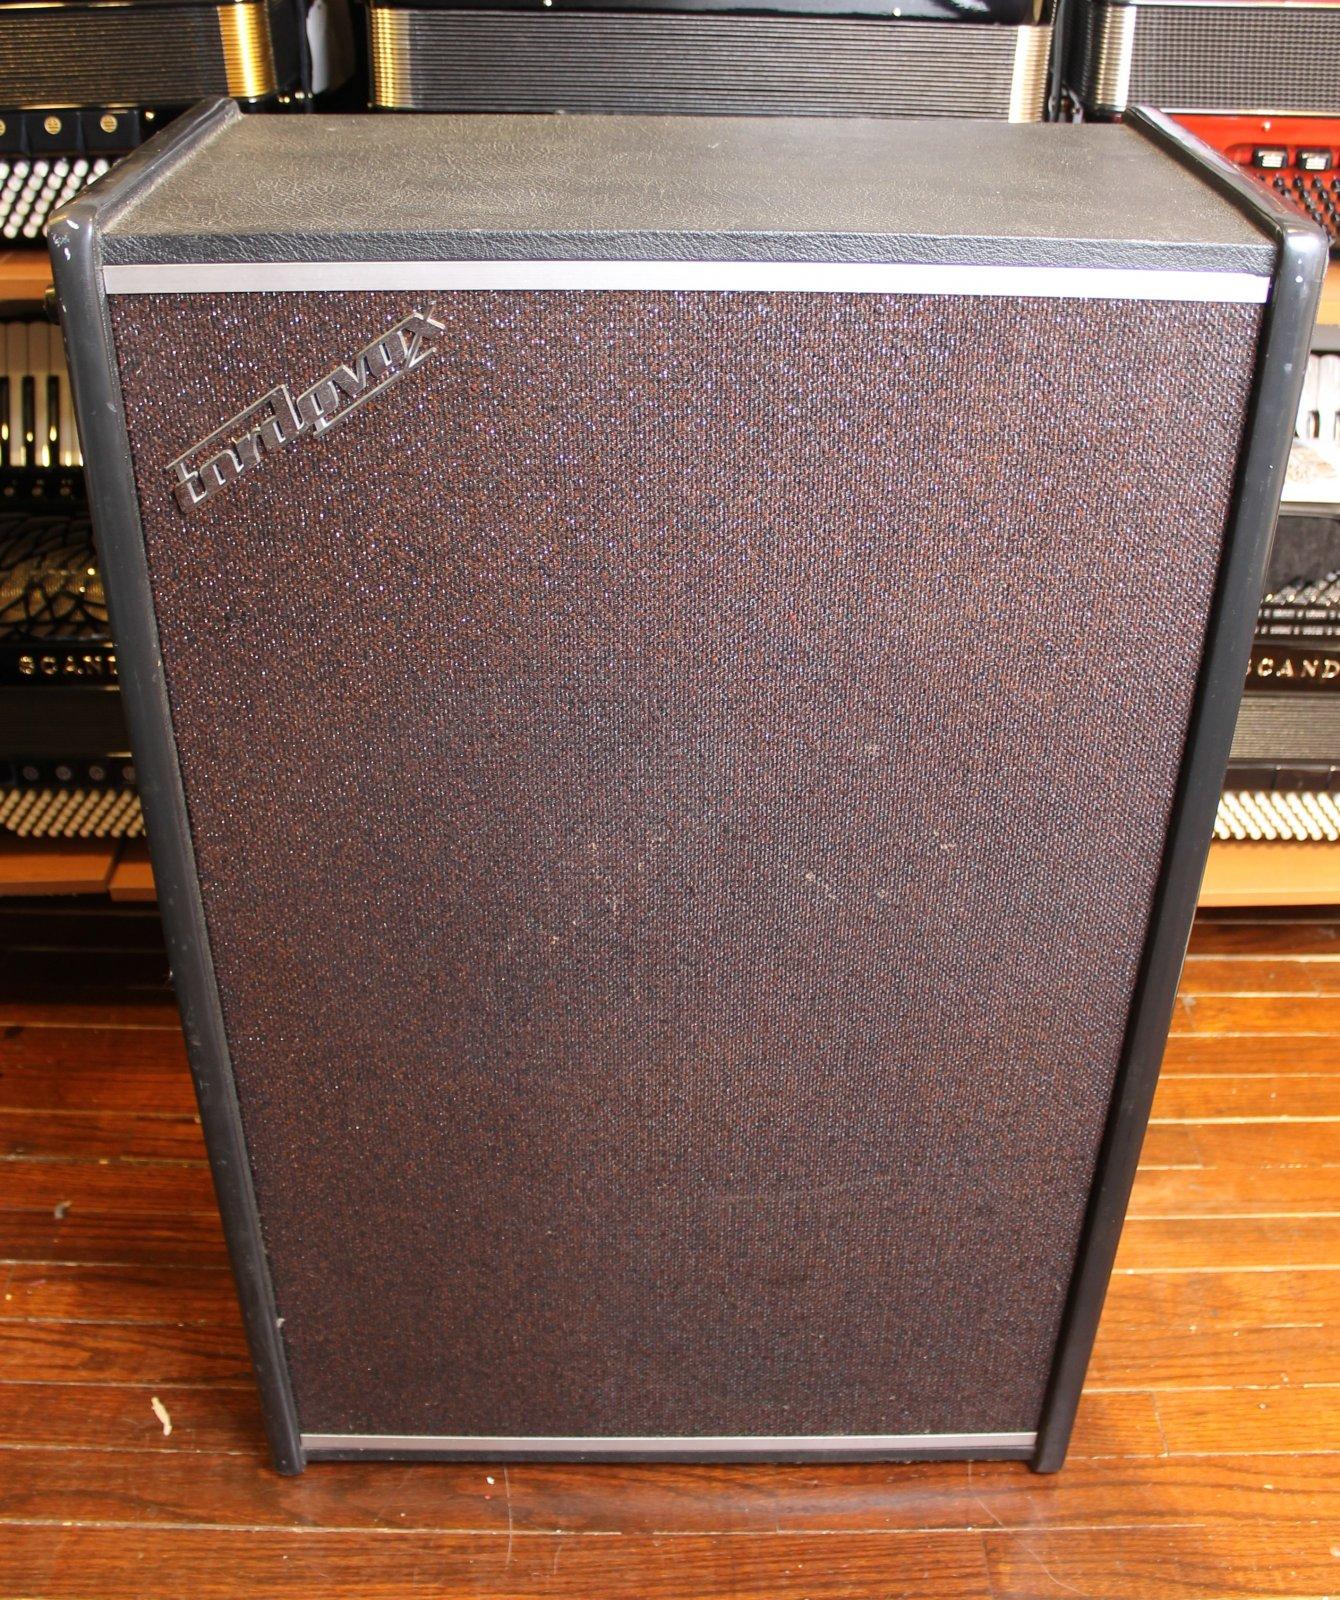 3890 - Cordovox CXA Solid State Amplifier 300 Watts Peak Power Vintage 1970s